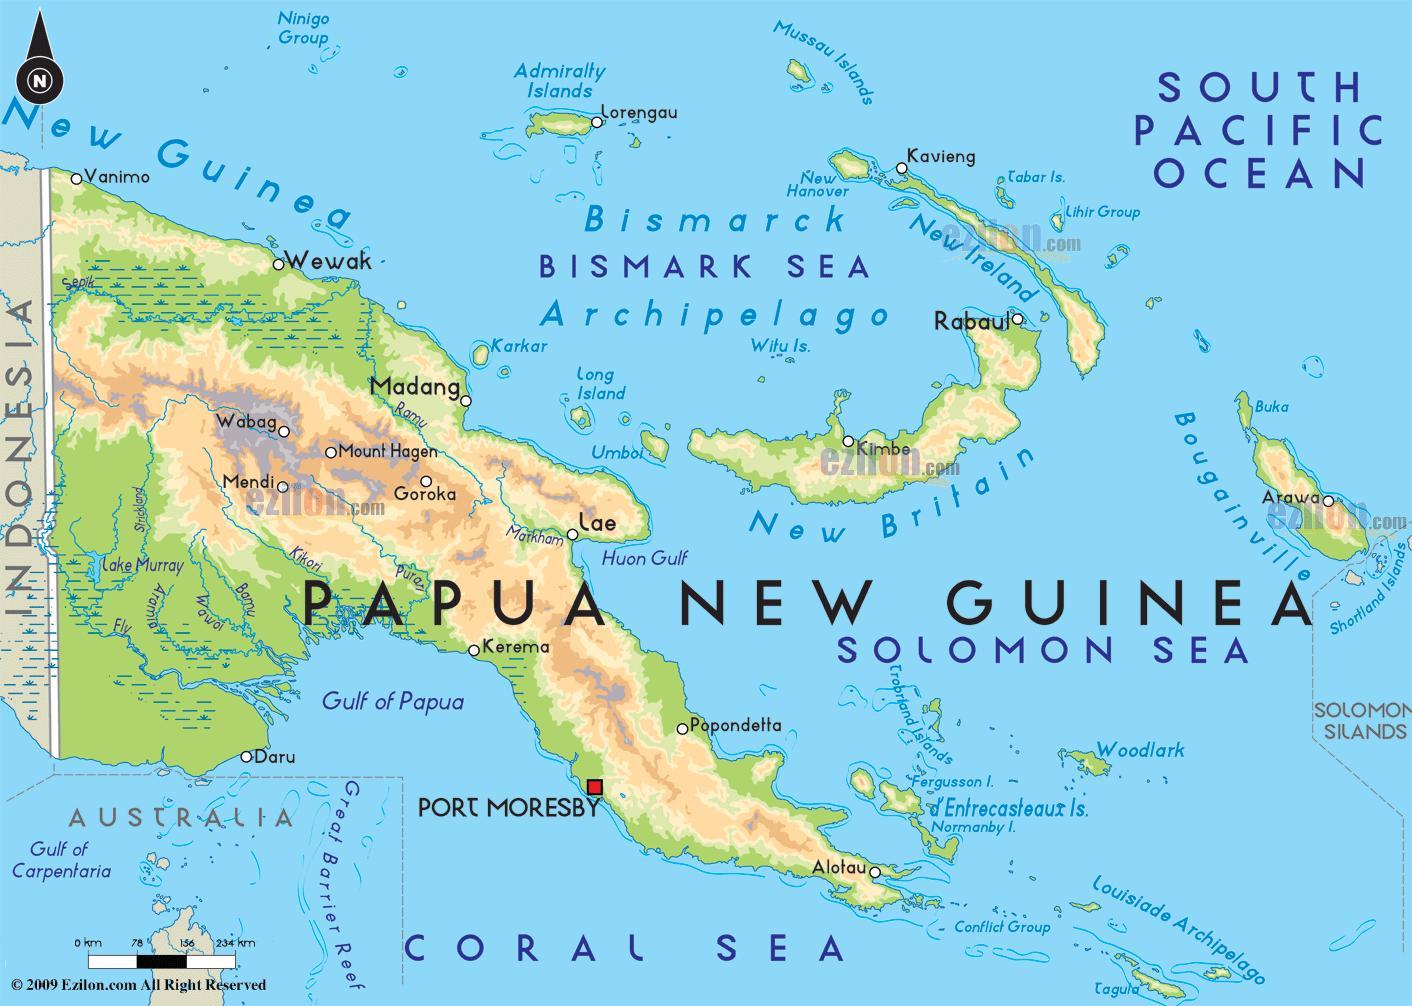 papua neuguinea karte Hauptstadt von papua neu guinea Karte   Karte der Hauptstadt von